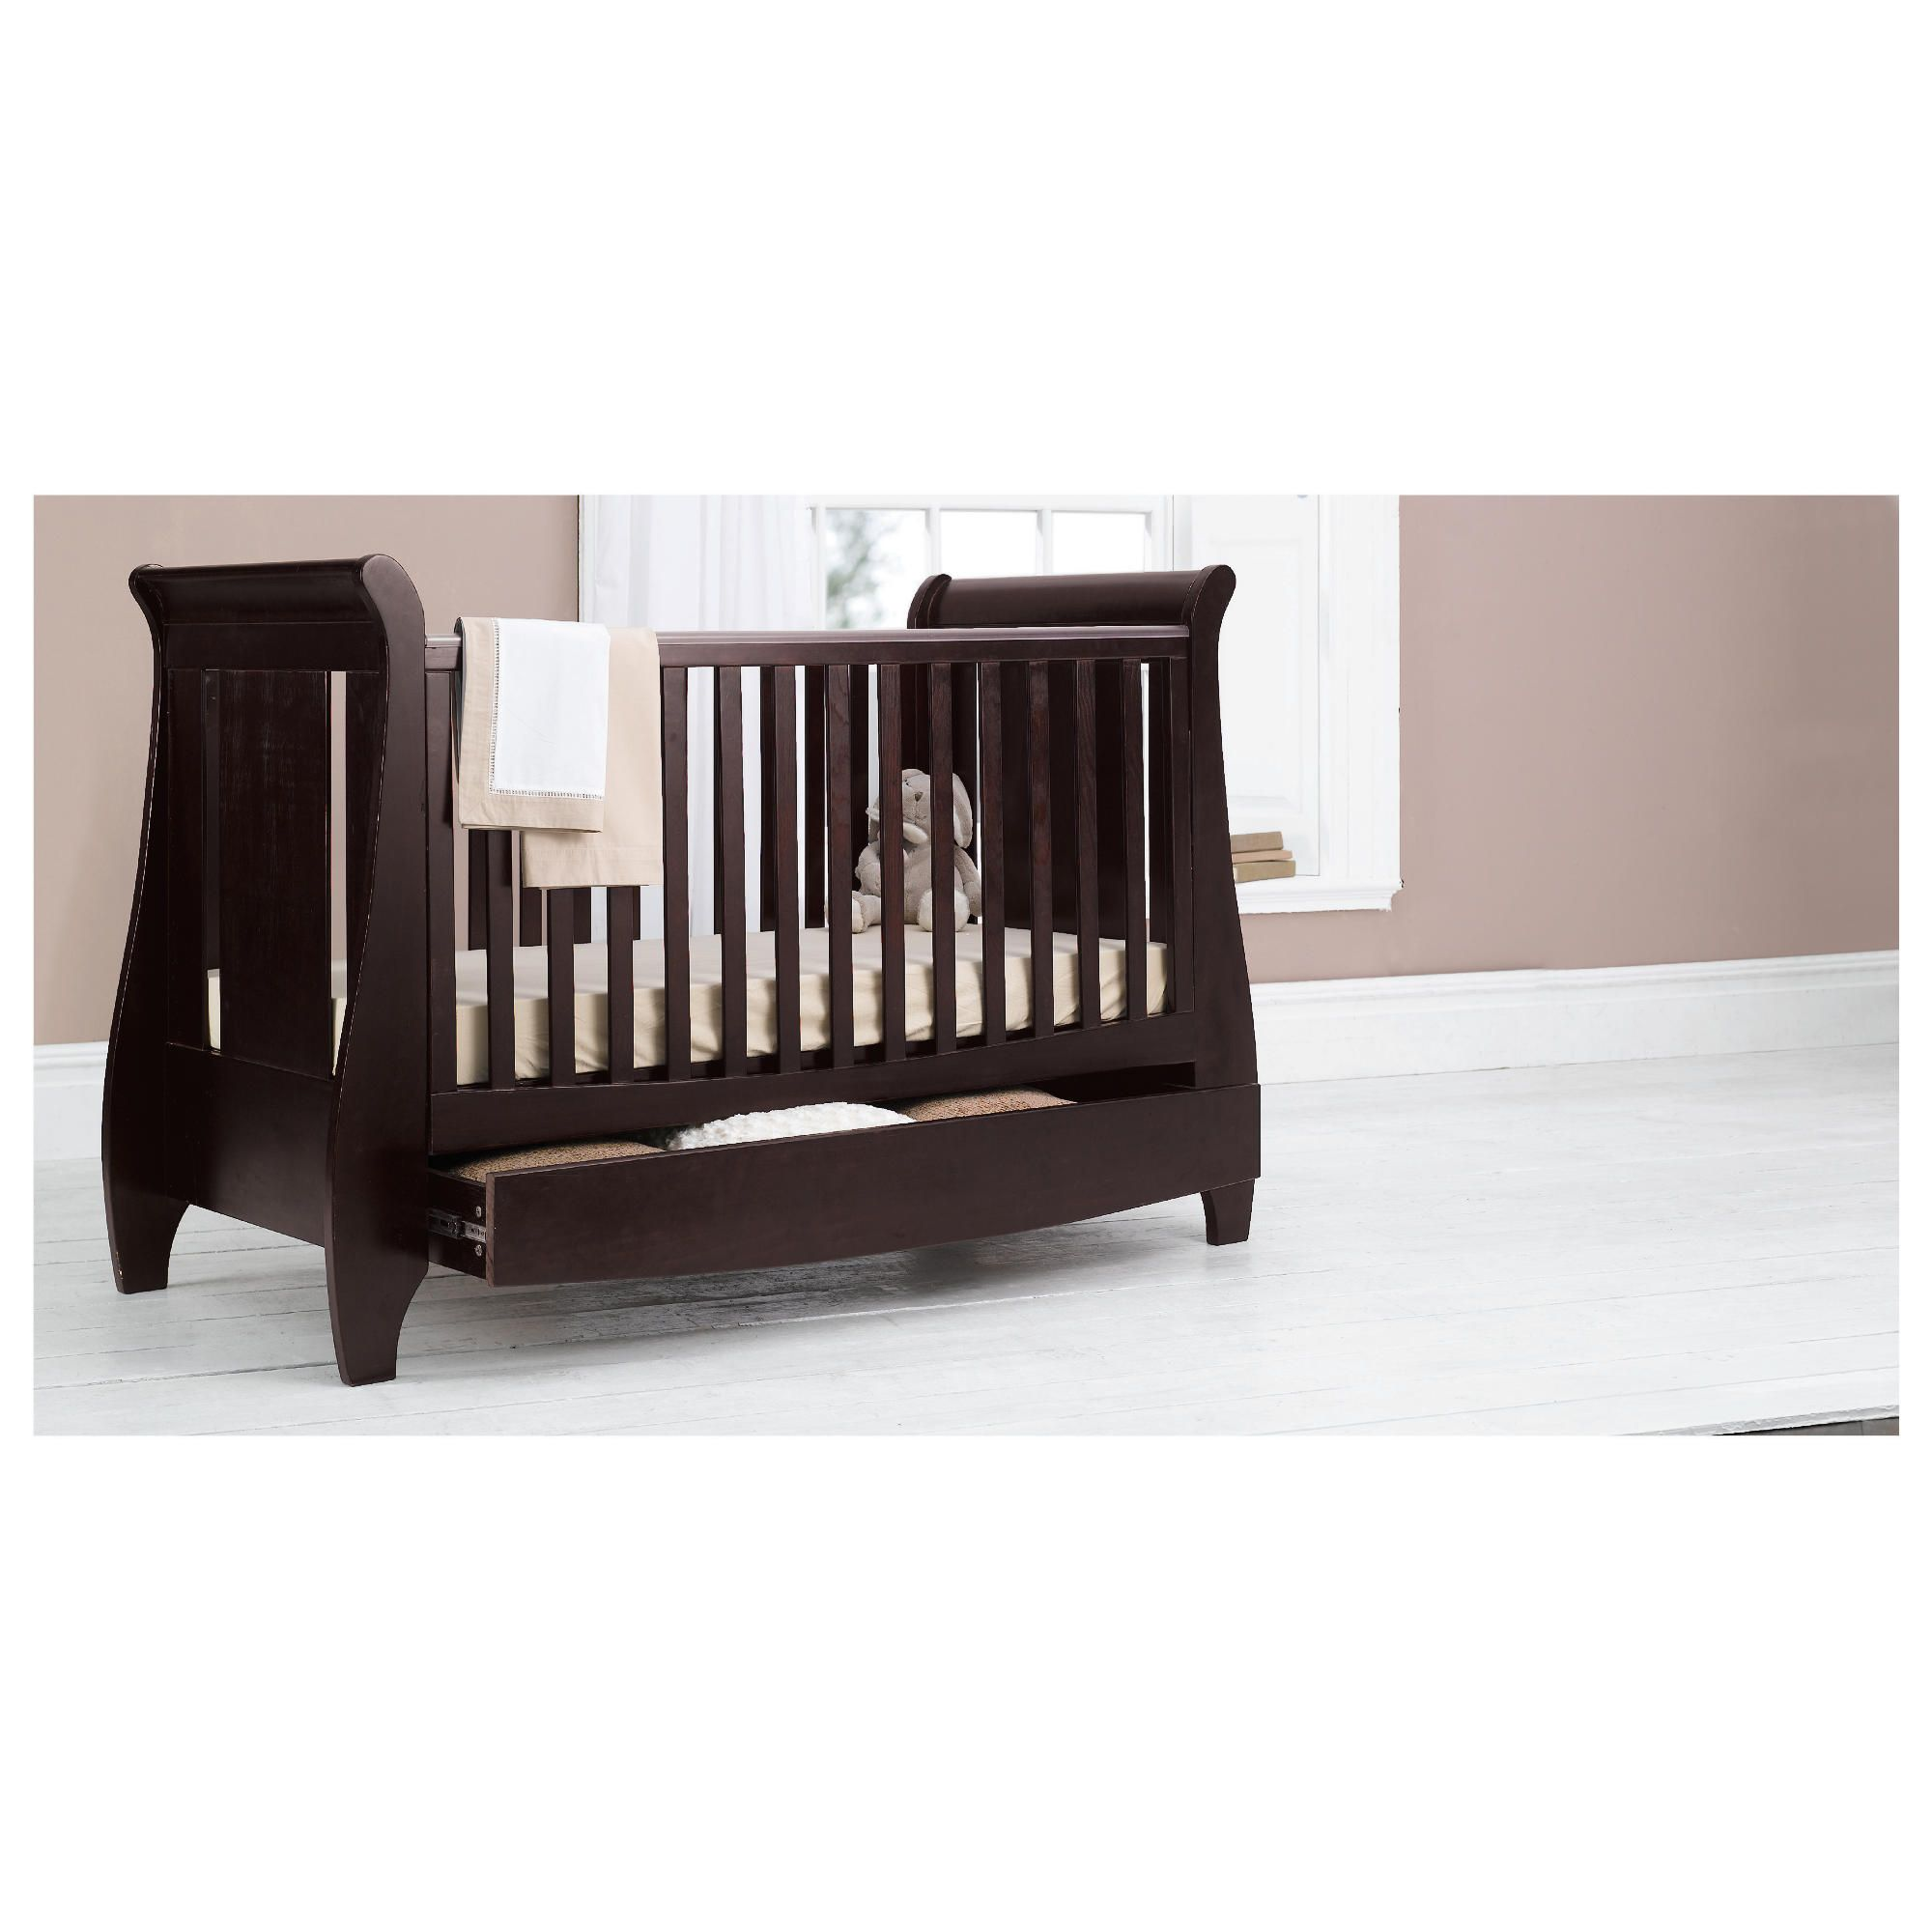 Tutti Bambini Lucas Dropside Sleigh Cot Bed, Espresso at Tesco Direct